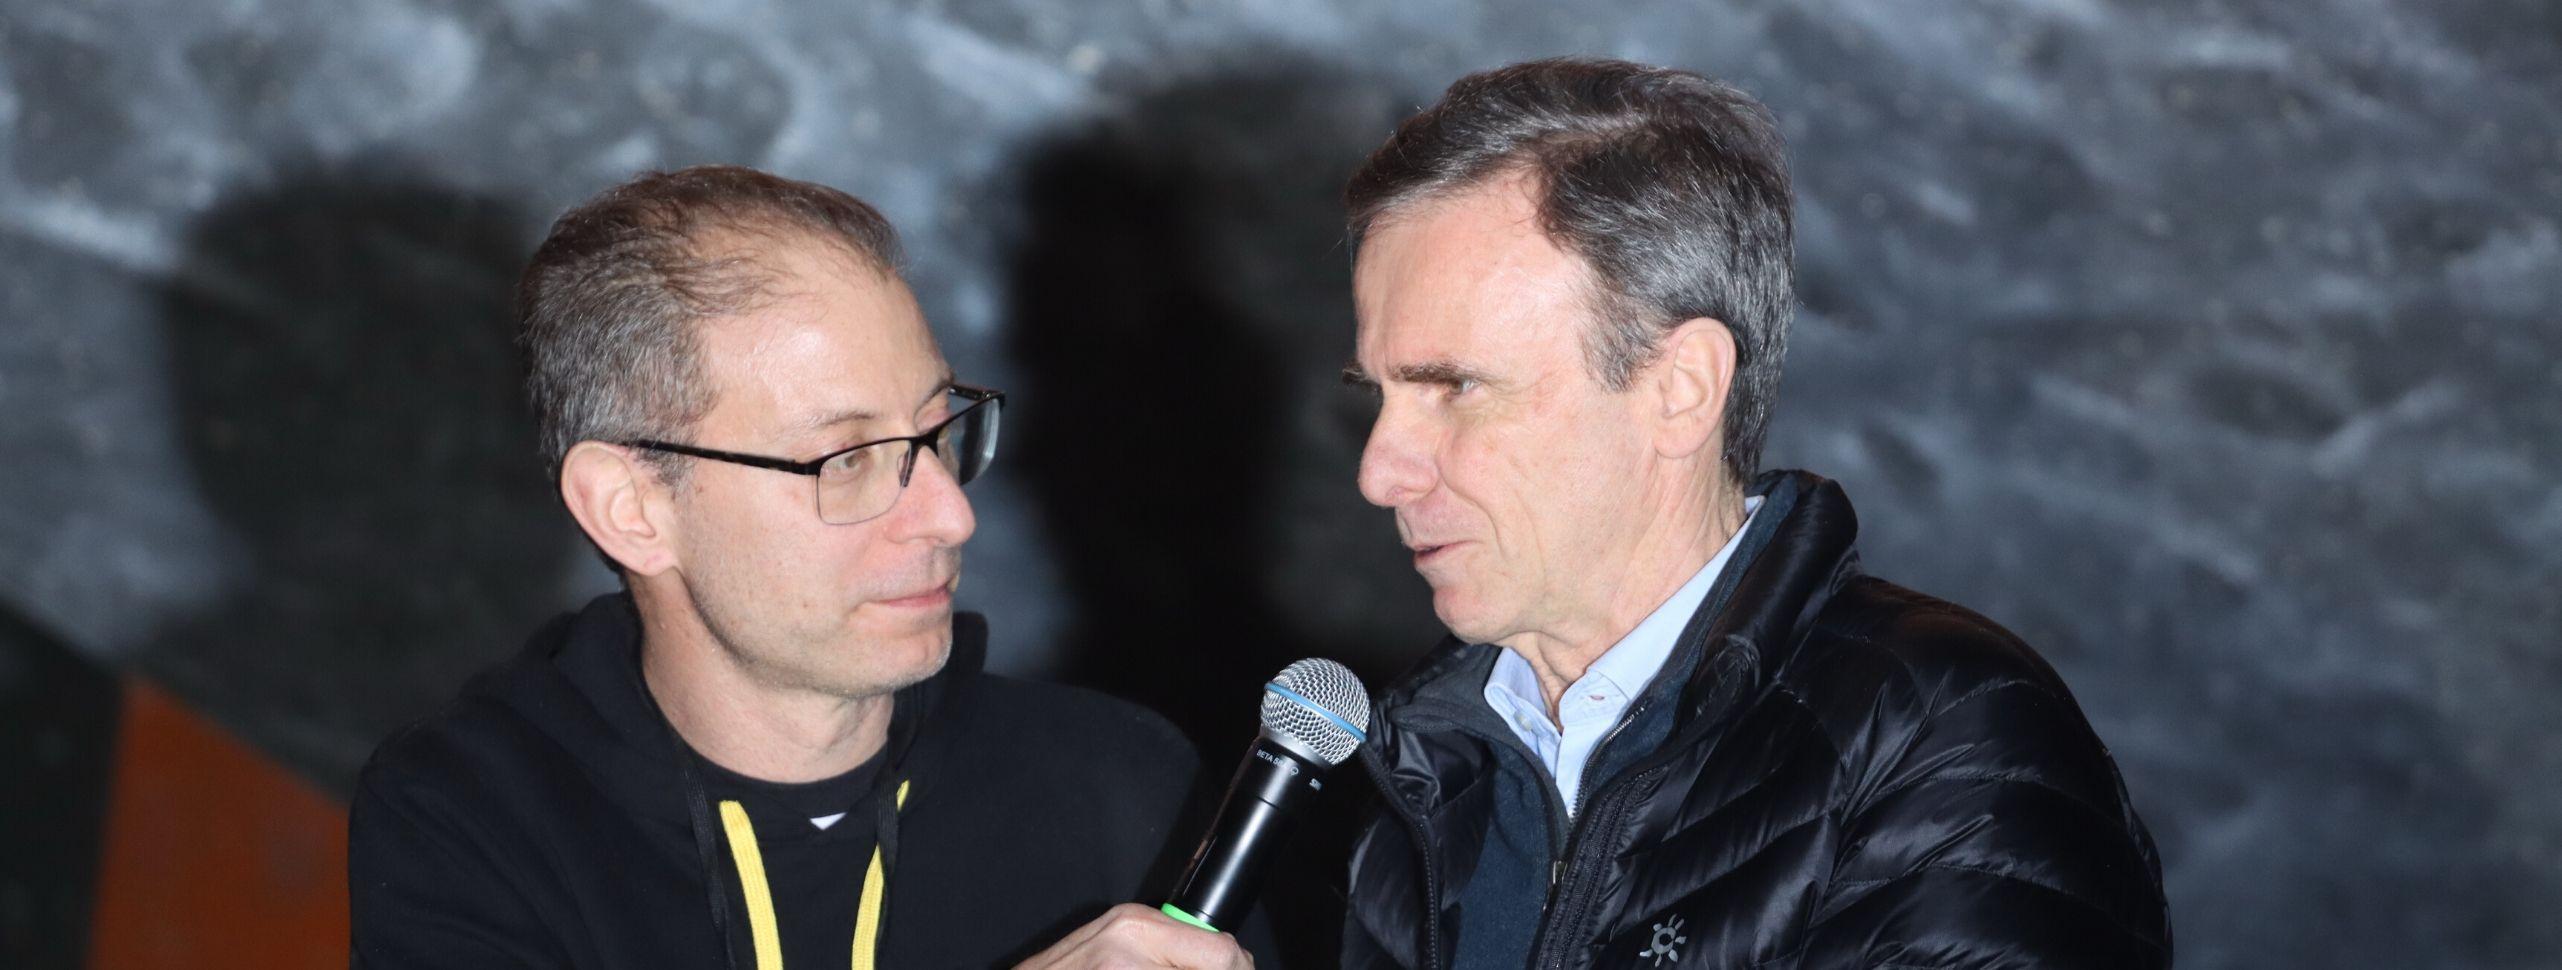 IFSC President Attends Milan Climbing Expo